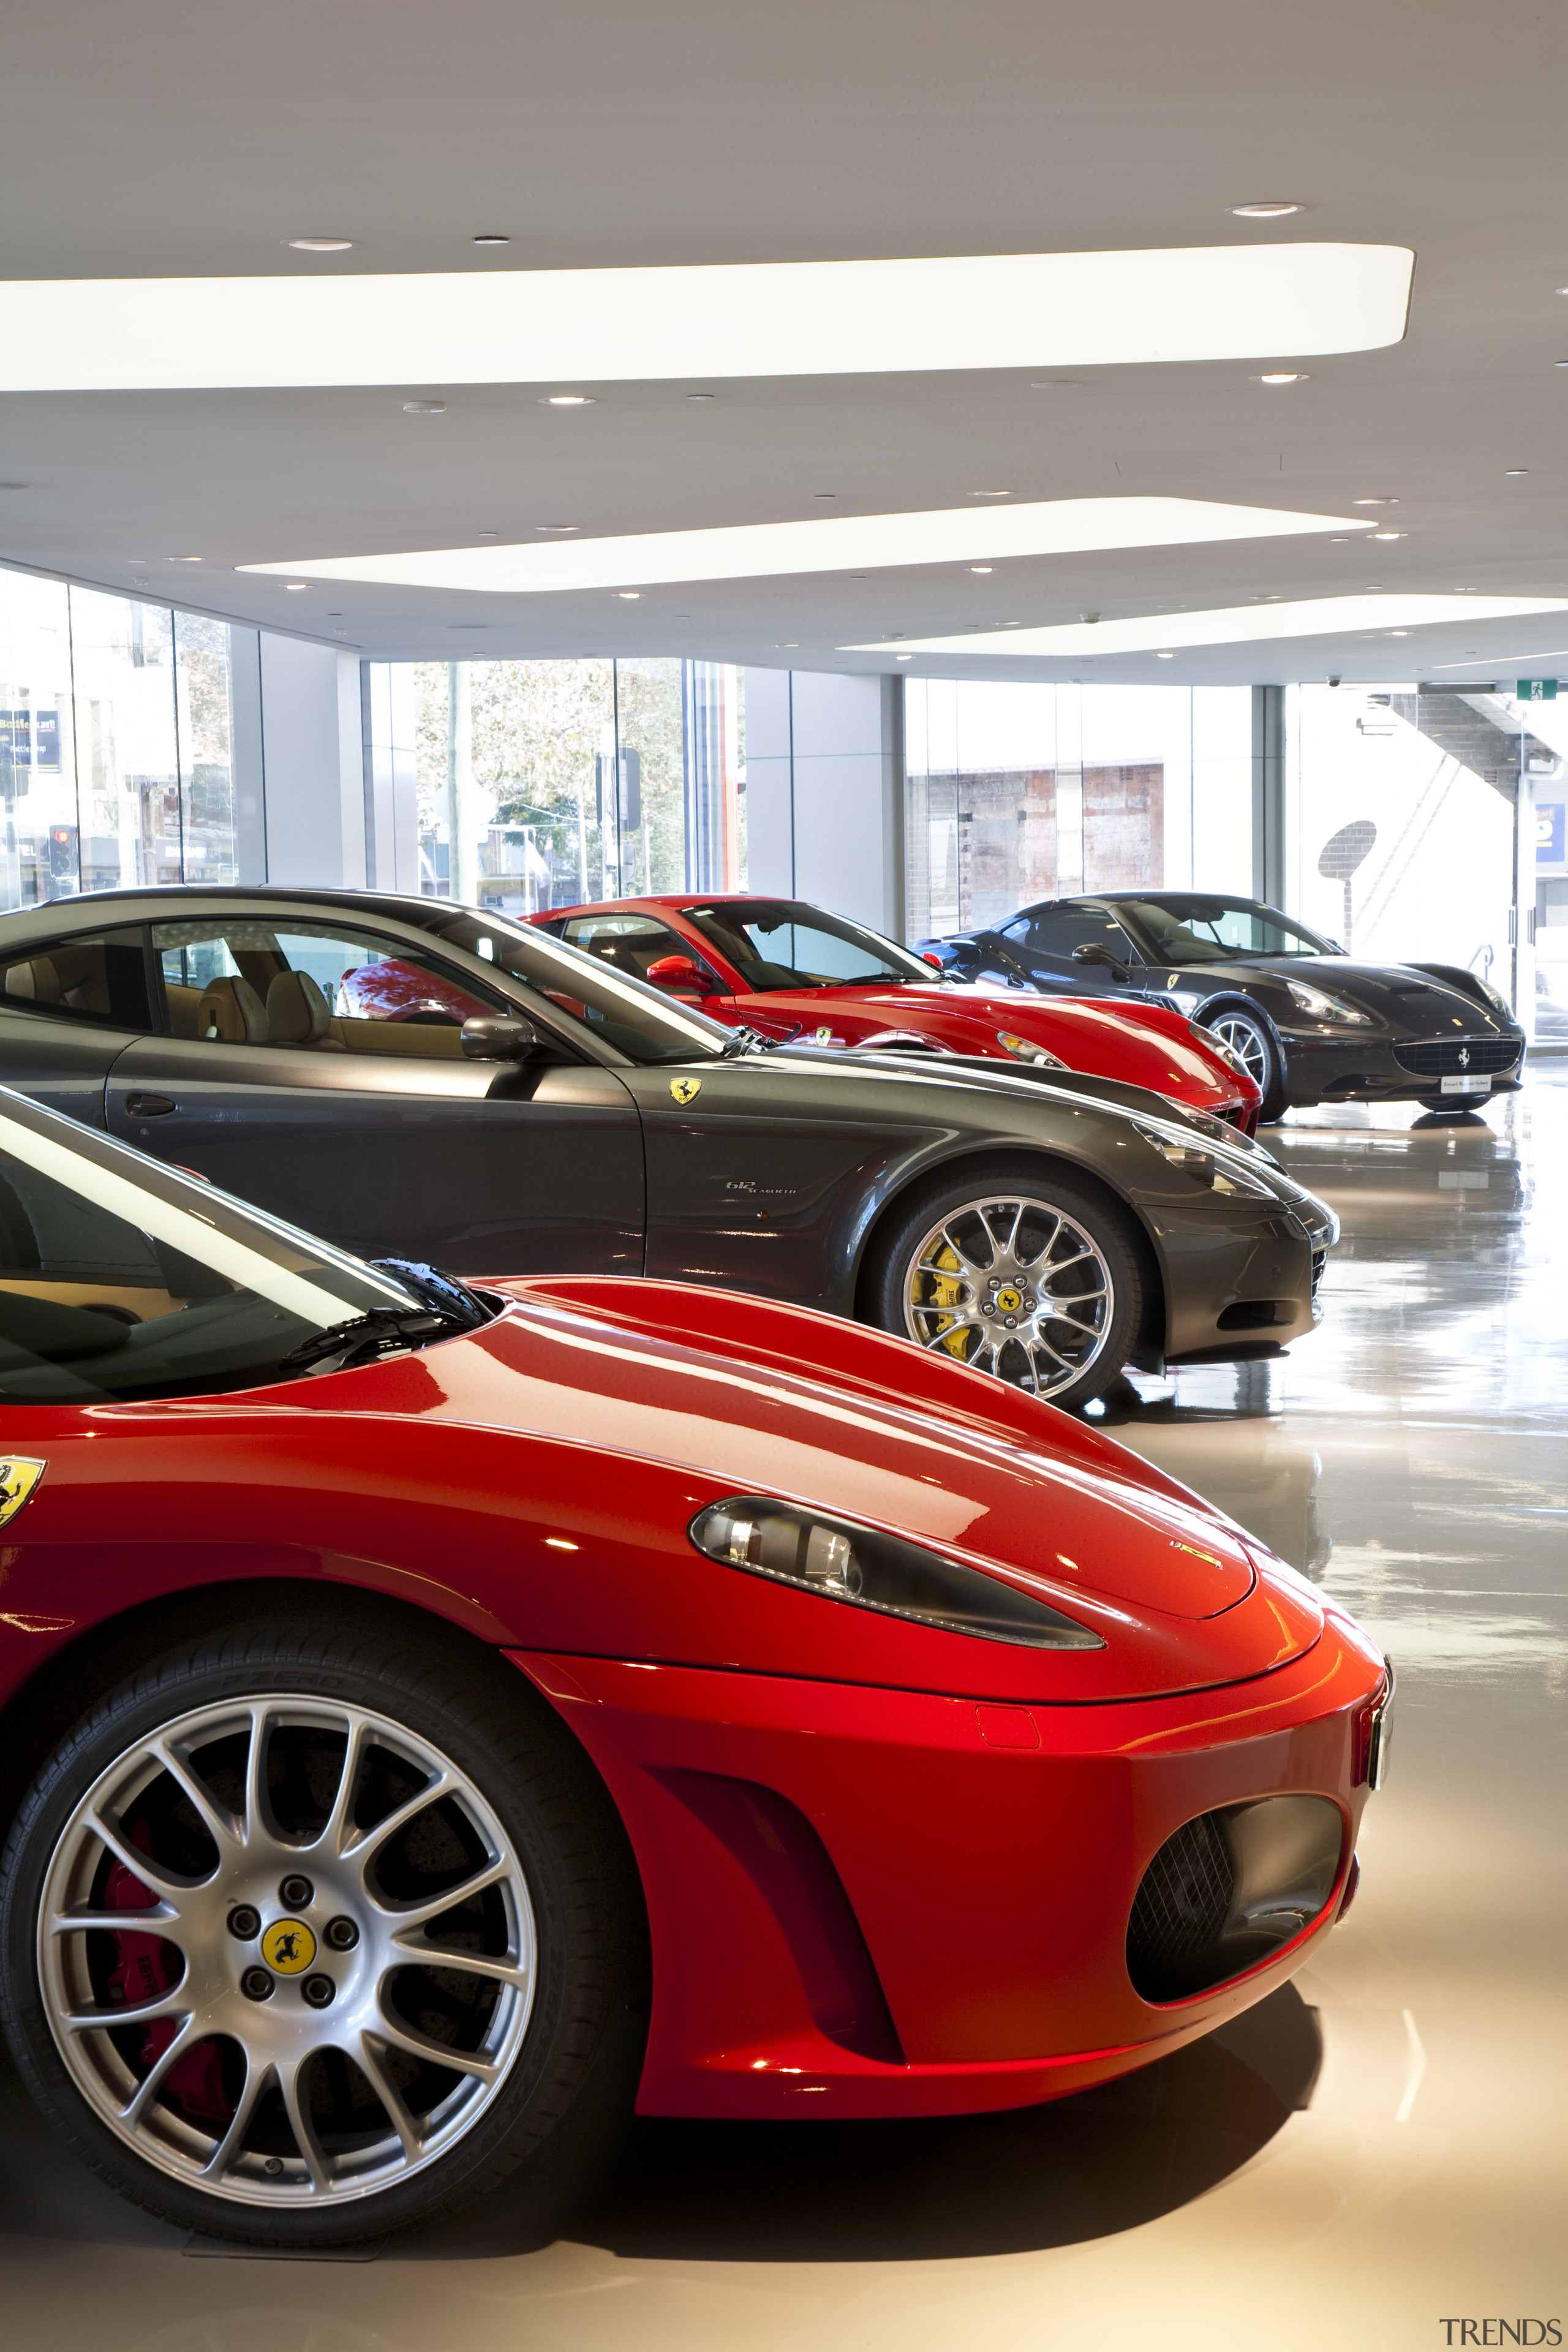 Ferrari Showroom in Australia - Ferrari Showroom in automotive design, automotive exterior, automotive wheel system, car, ferrari f430, ferrari f430 challenge, land vehicle, luxury vehicle, motor vehicle, performance car, race car, red, sports car, supercar, vehicle, wheel, white